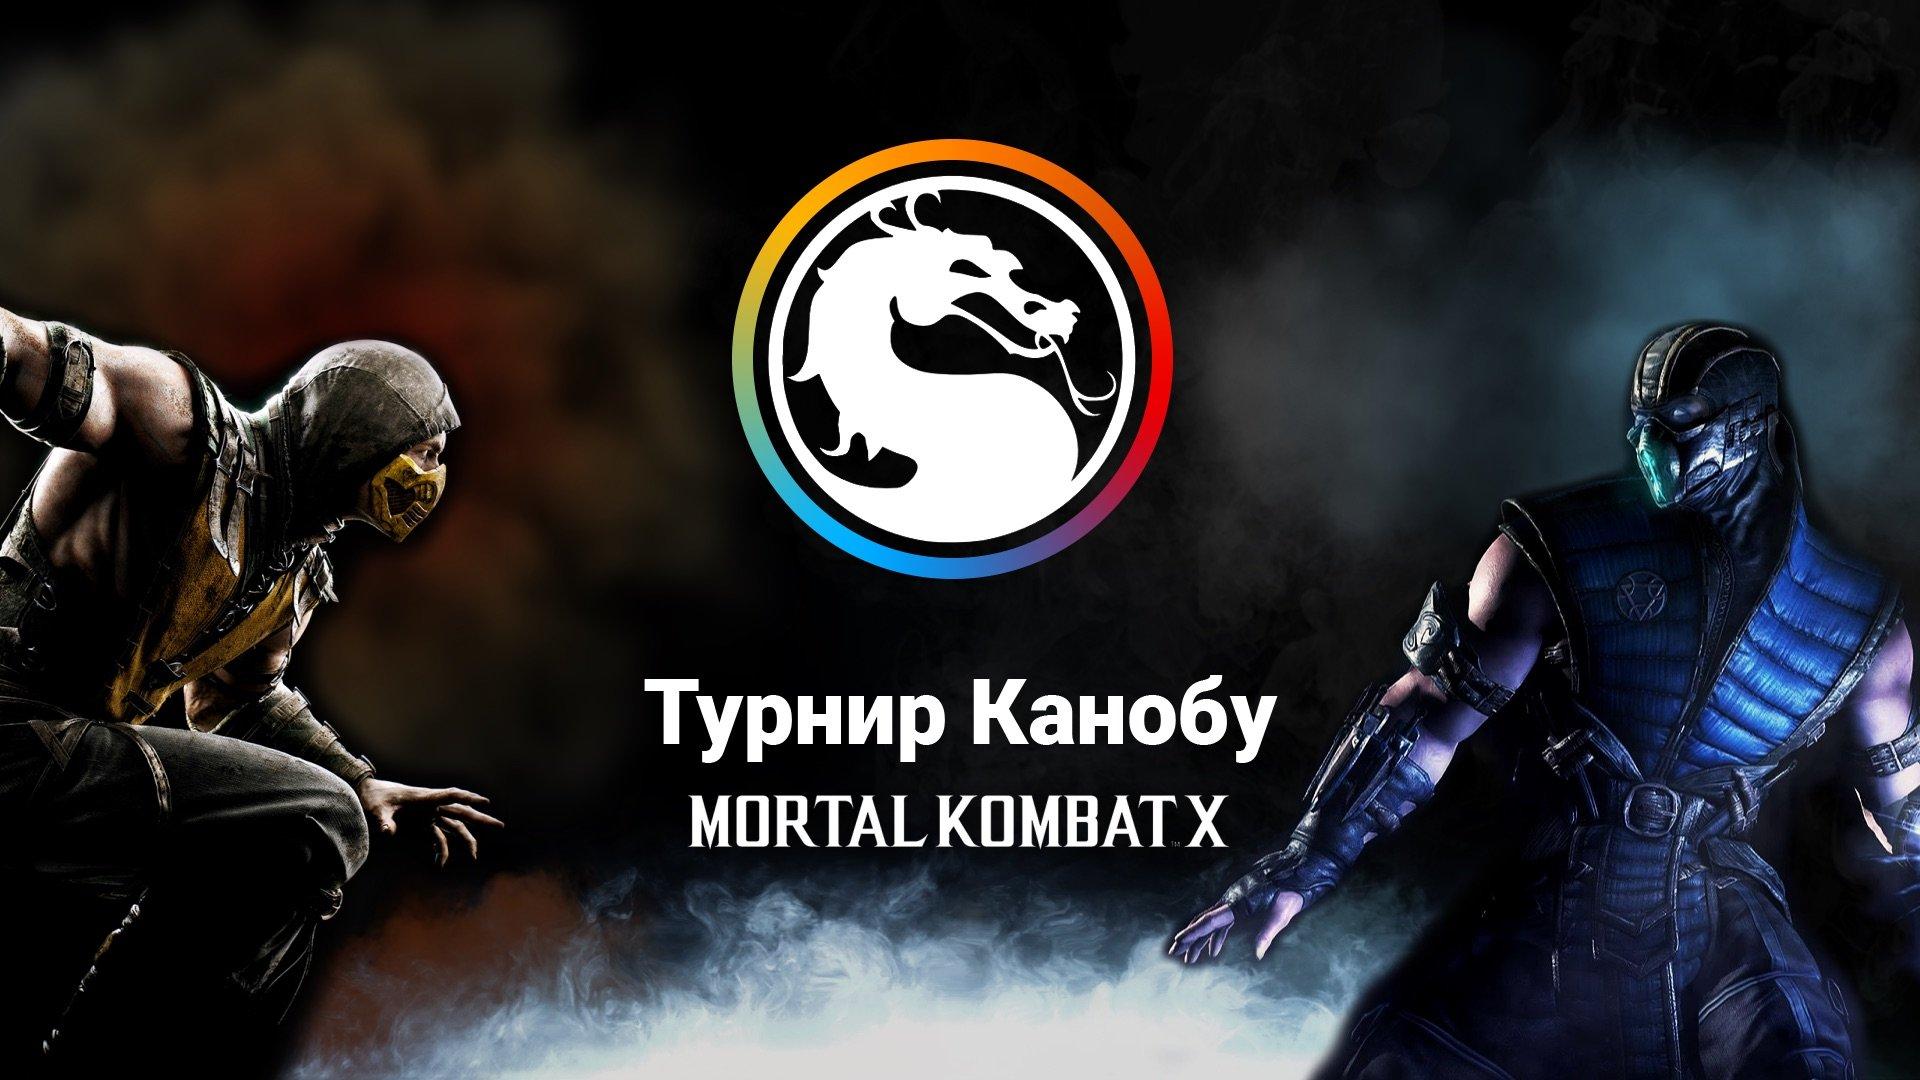 Трансляция плей-офф турнира Канобу по Mortal Kombat X - Изображение 1